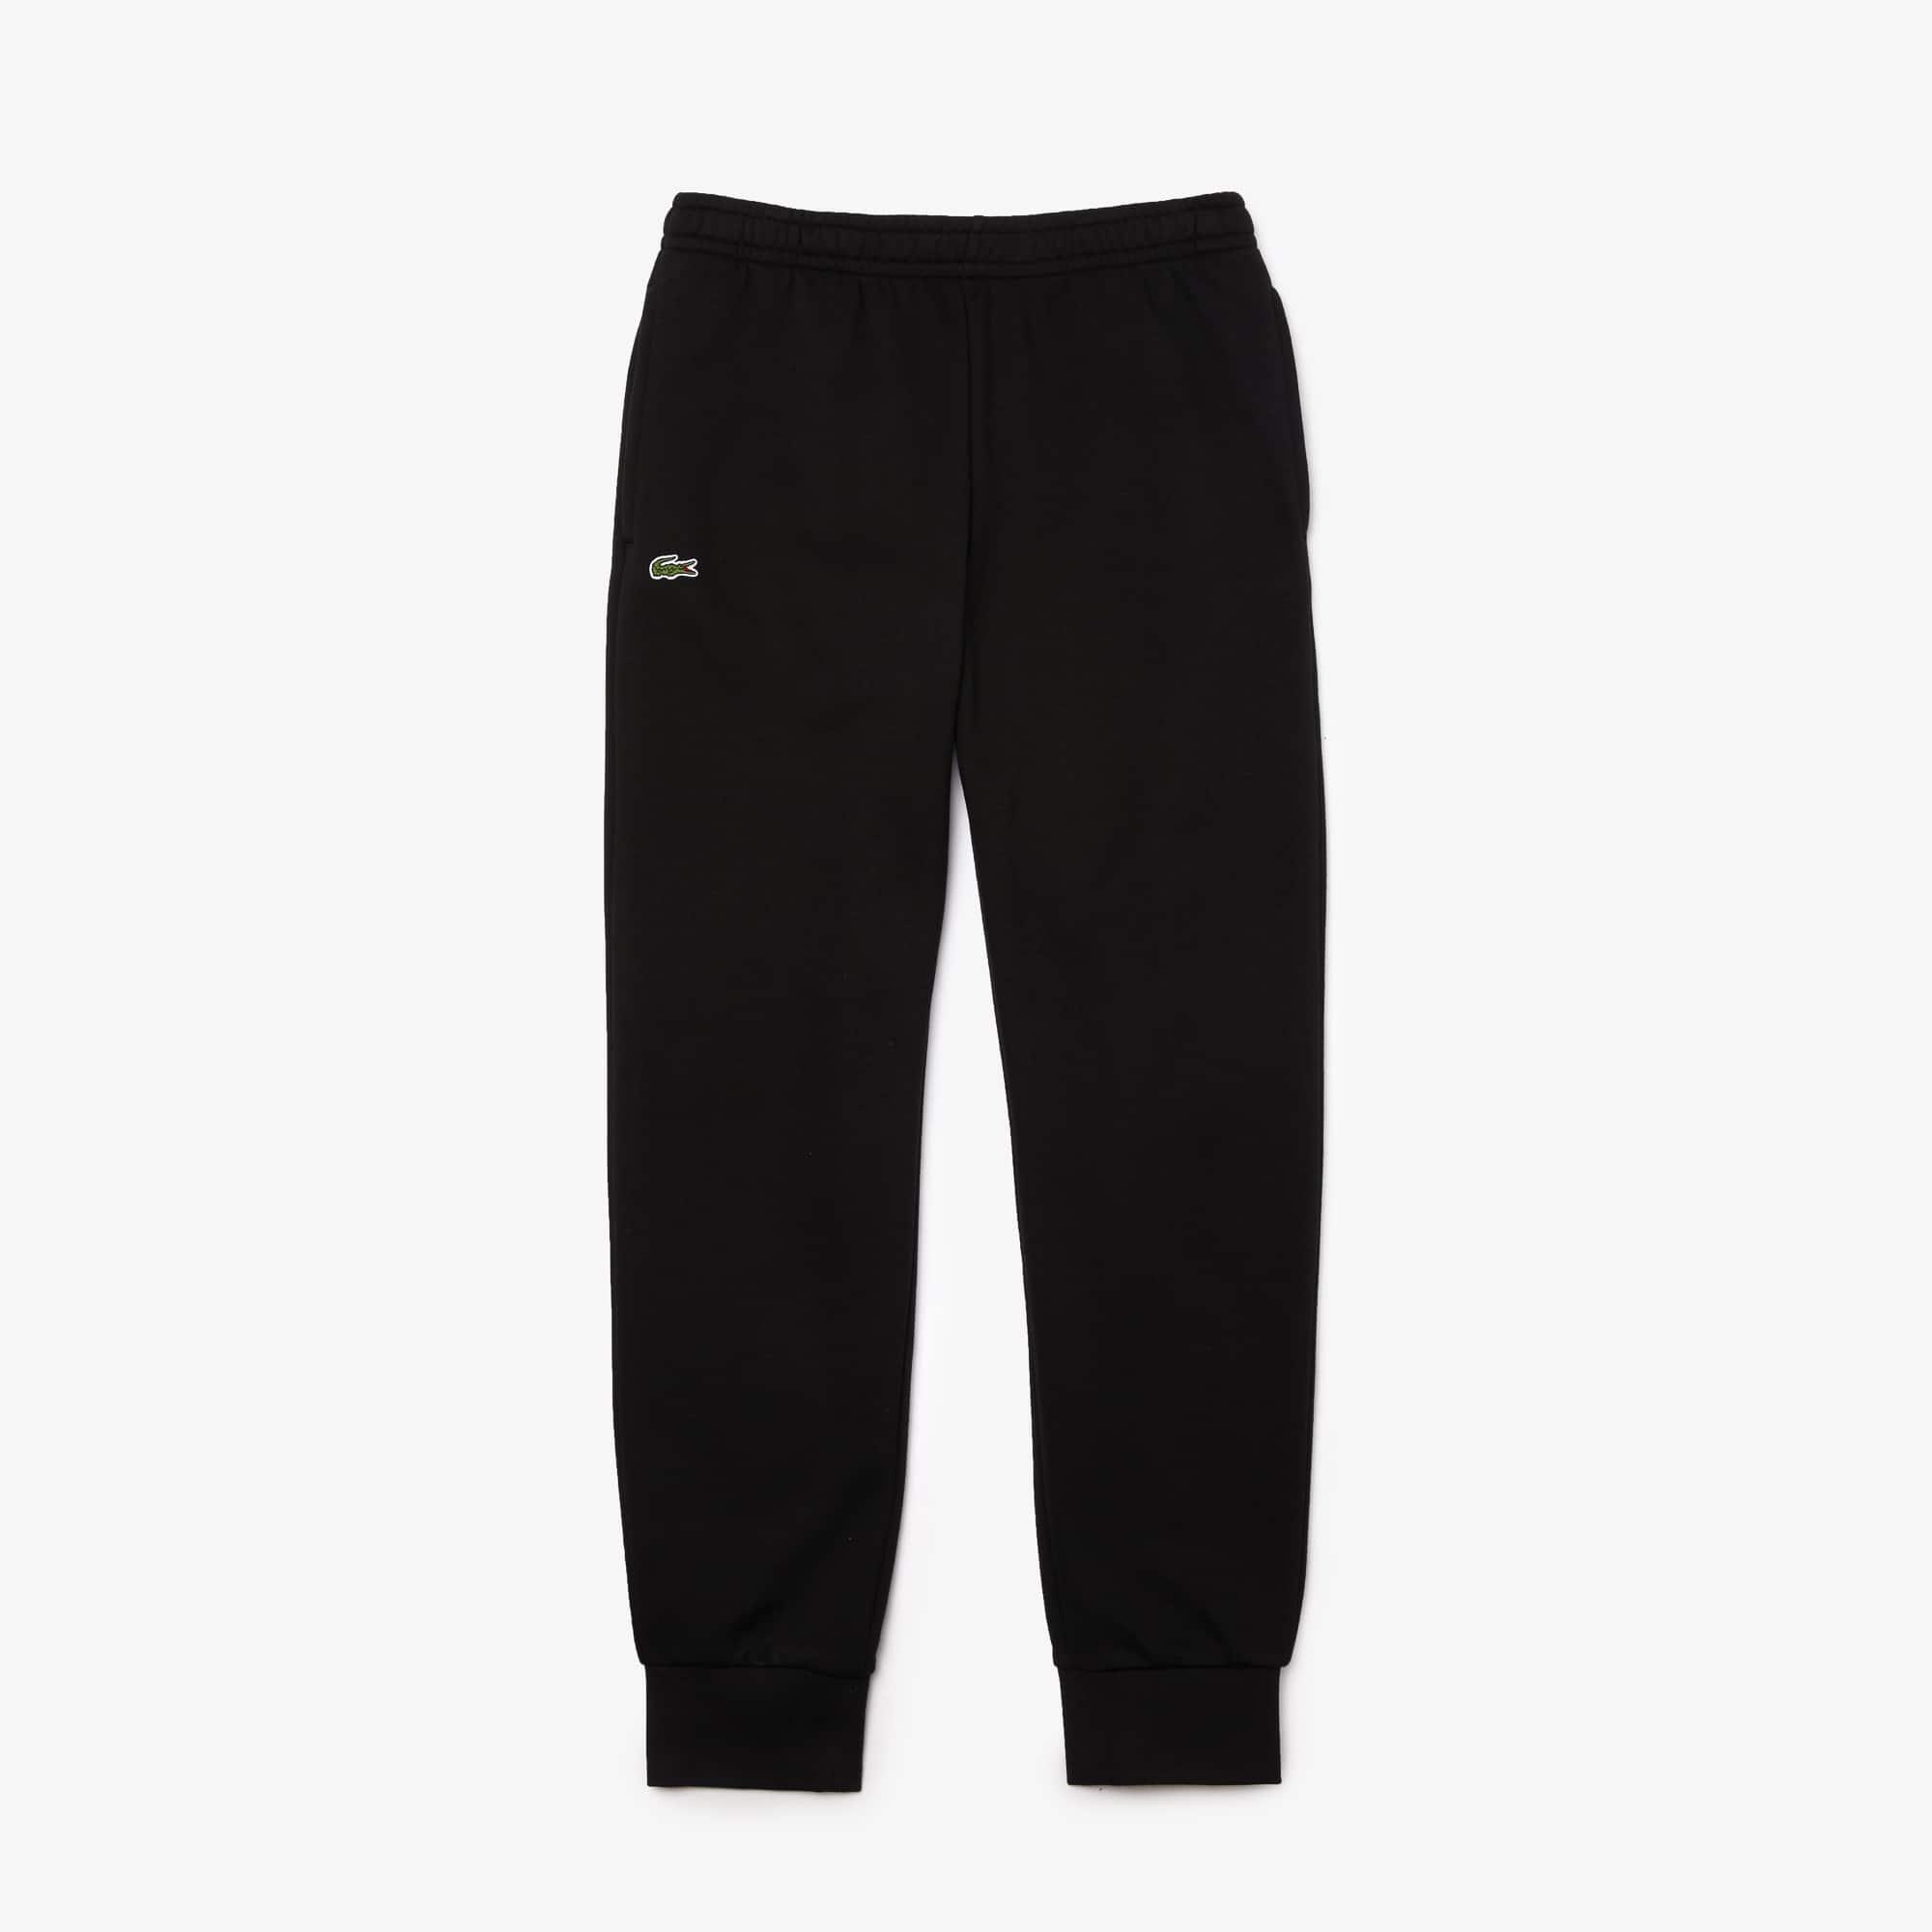 Pantaloni tuta Tennis Lacoste SPORT in cotone tinta unita